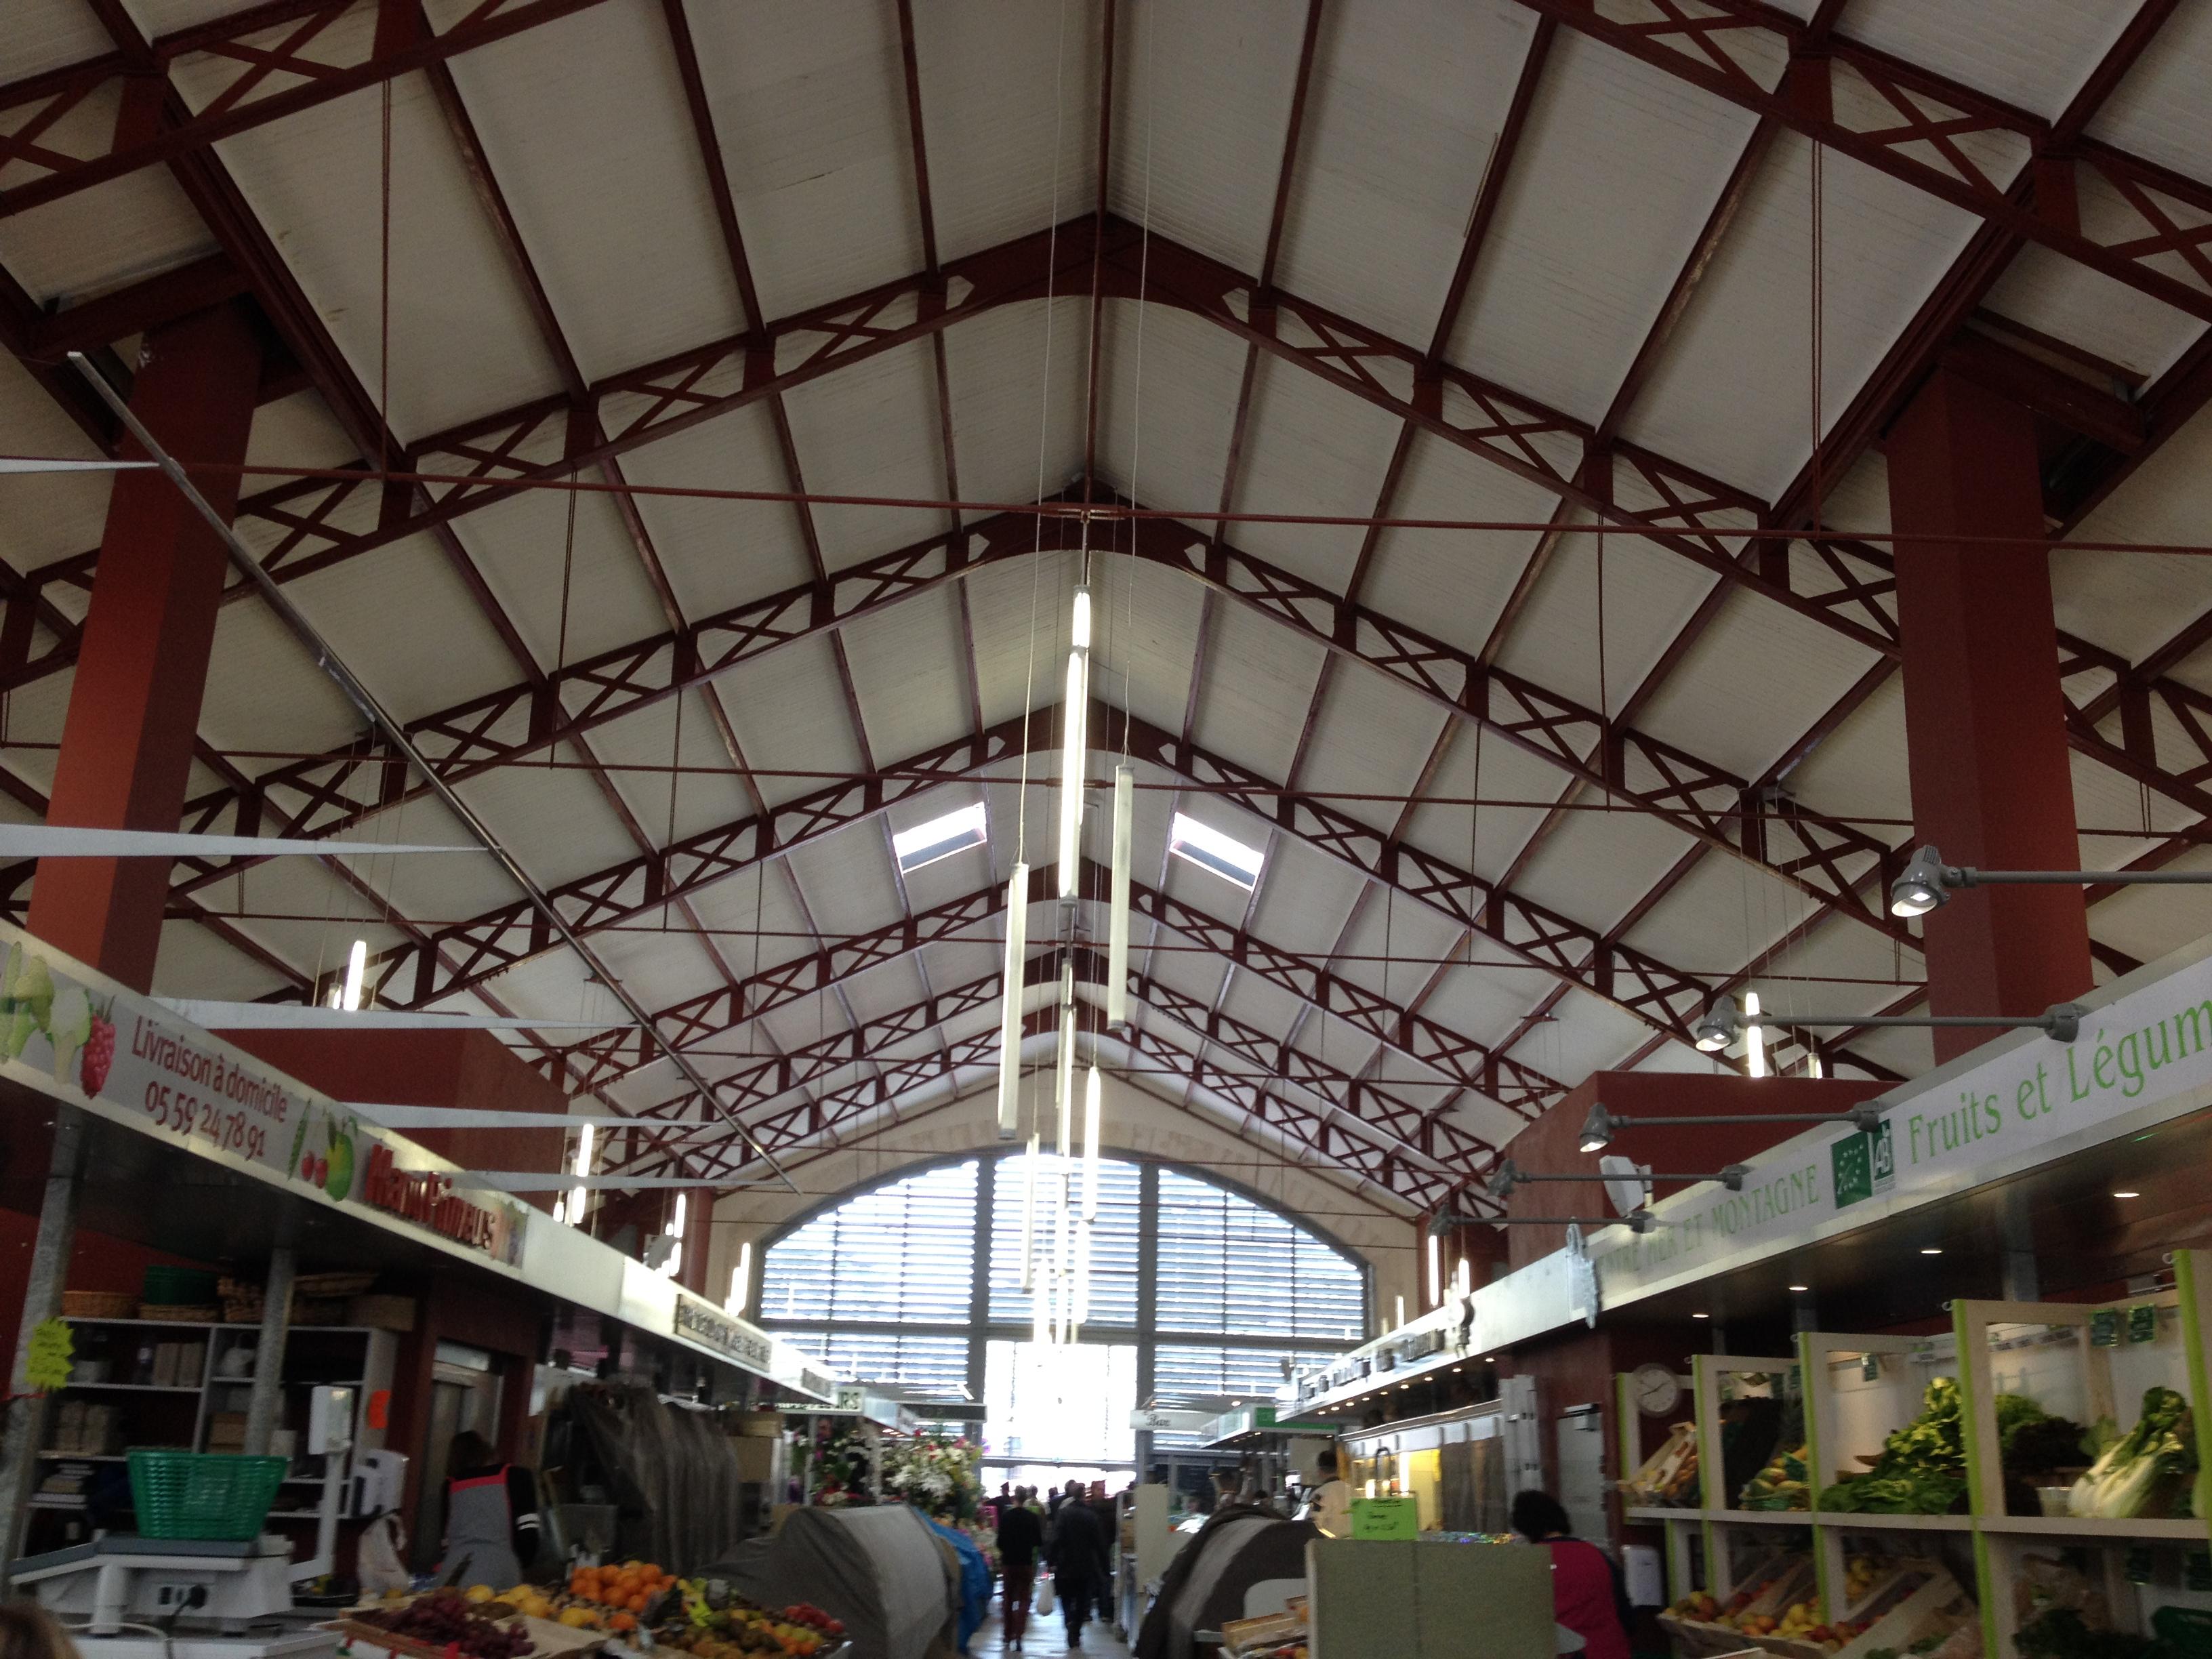 Les Halles Biarritz